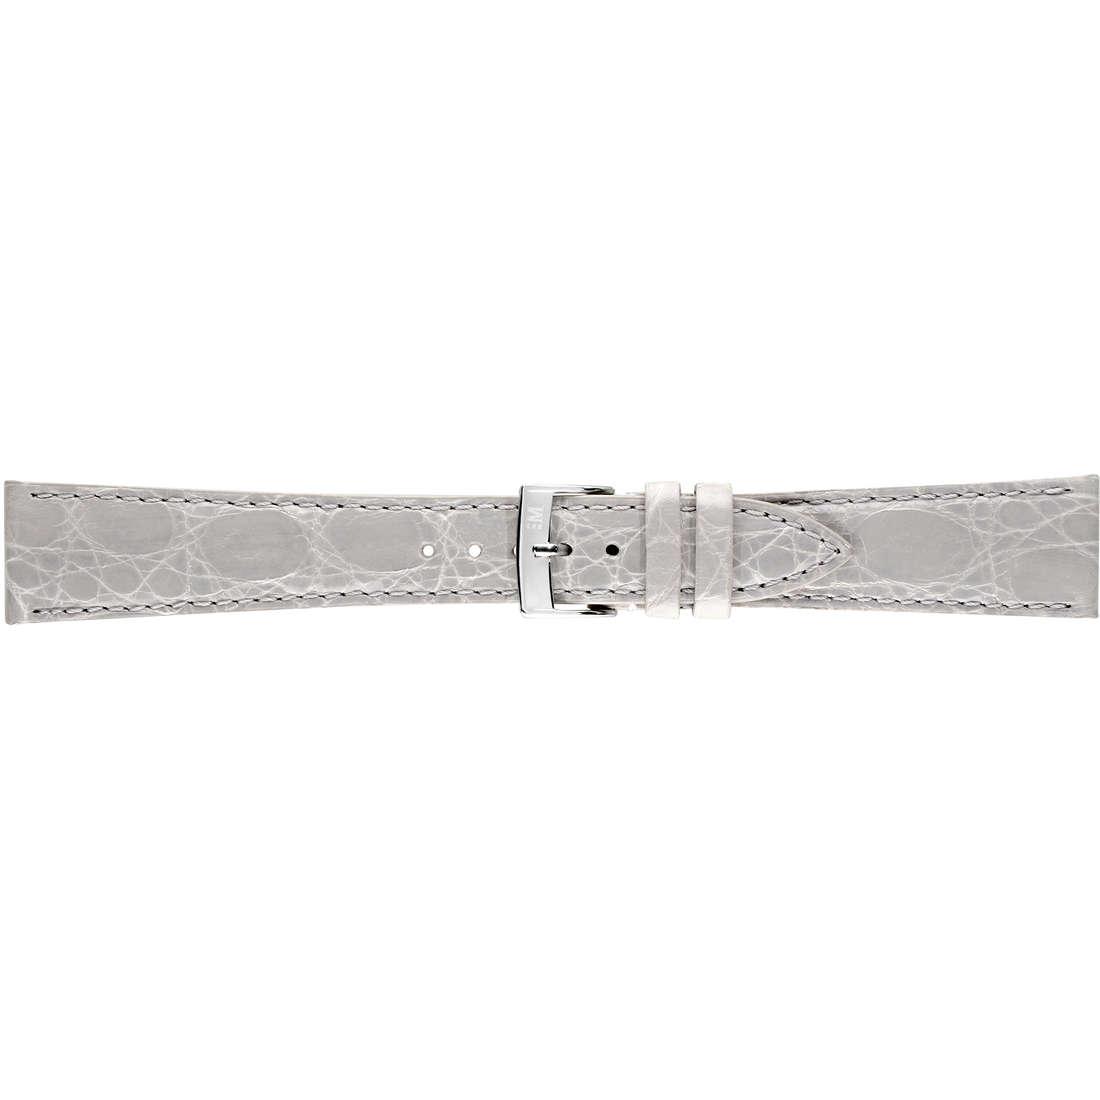 watch watch bands watch straps man Morellato Pelli Preziose A01X2197052093CR20